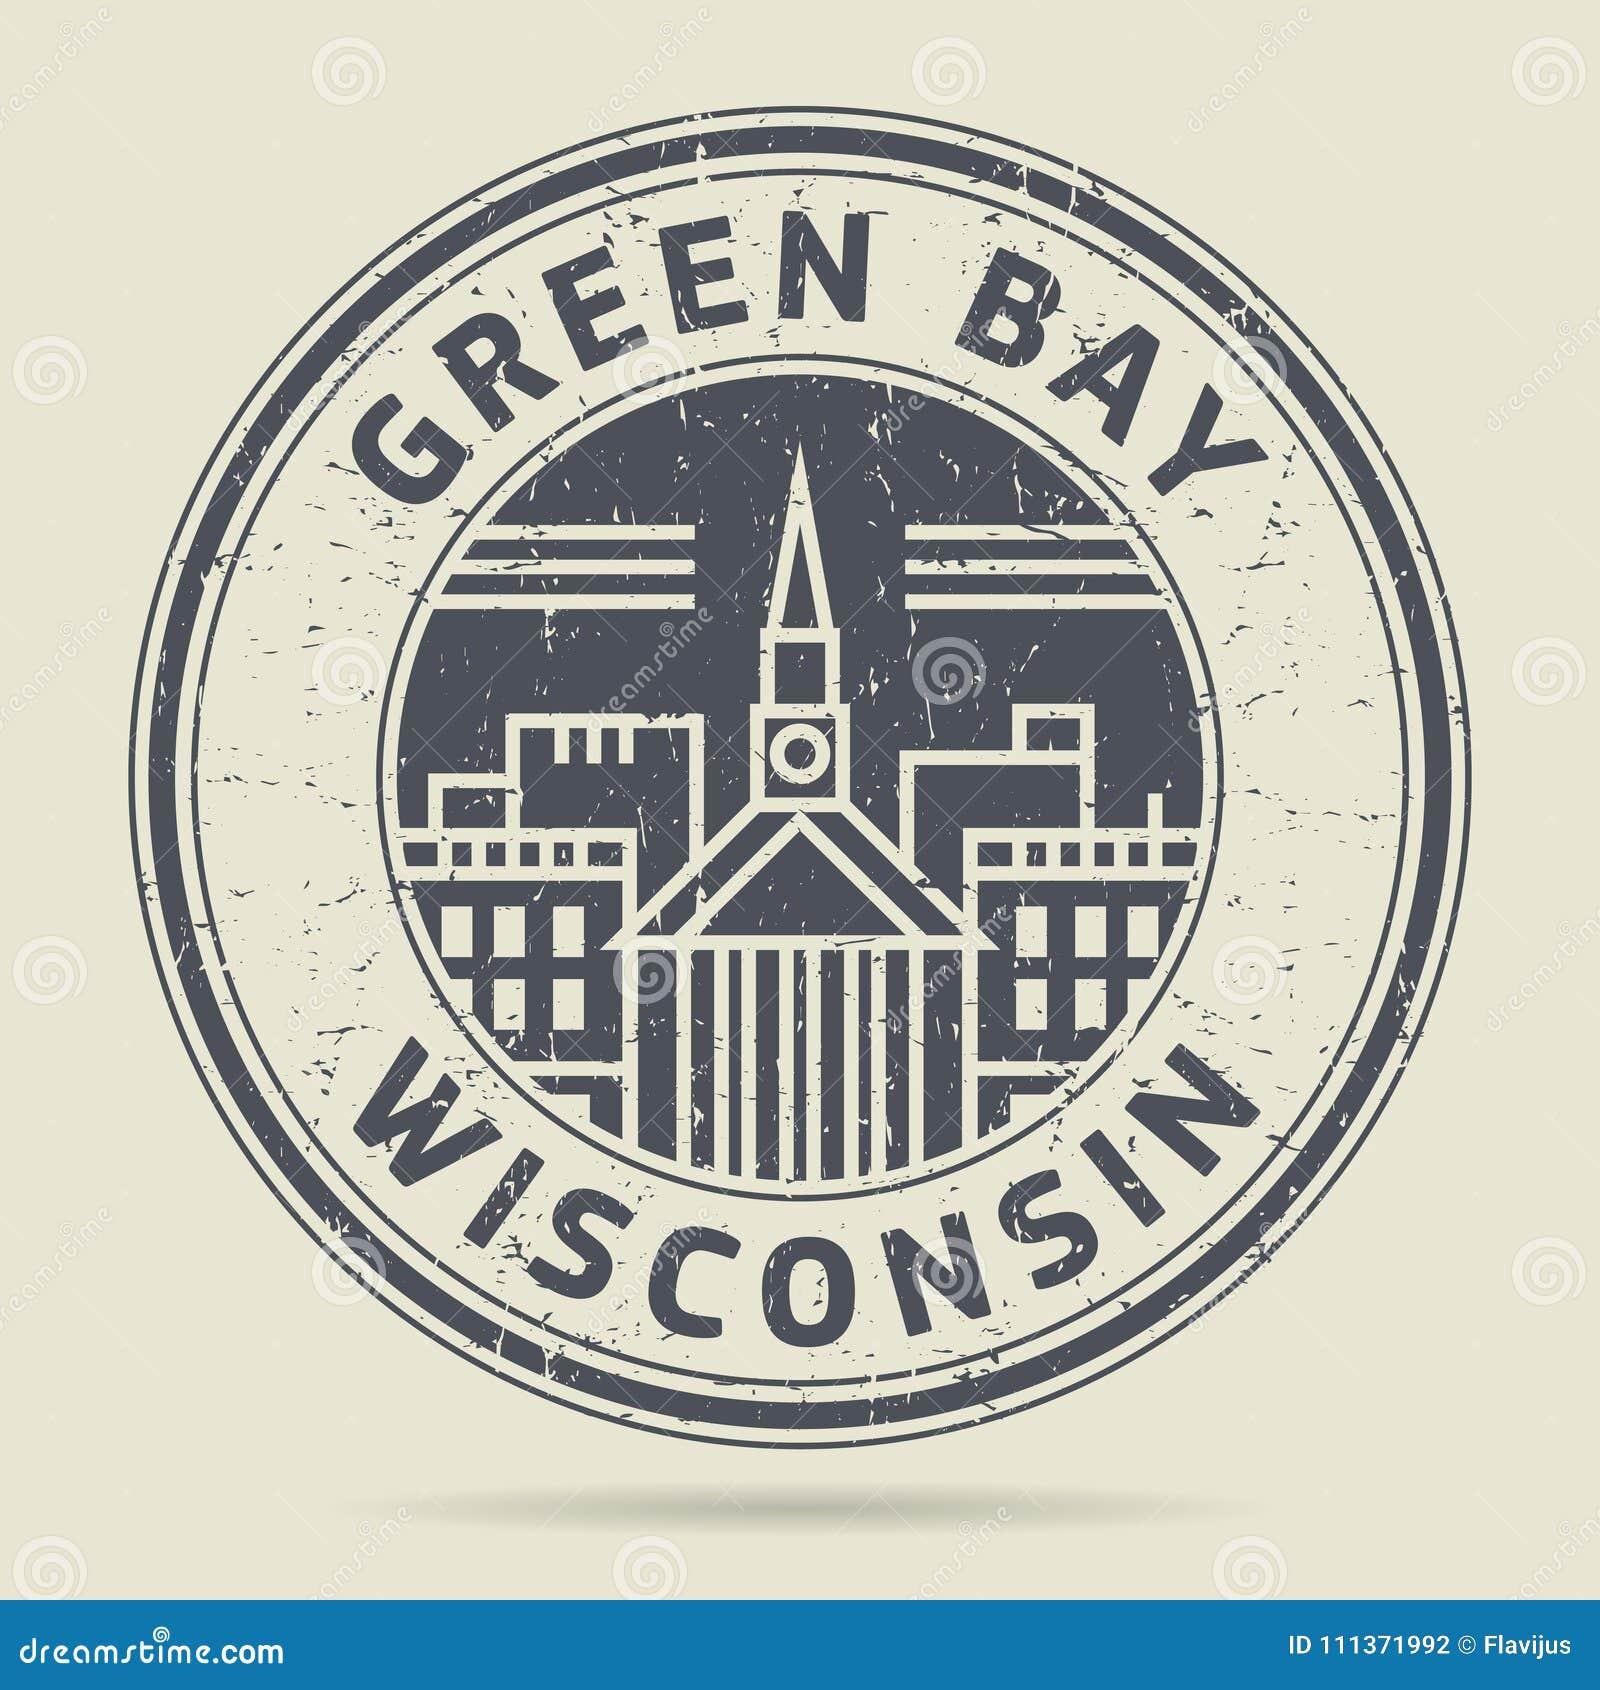 Избитая фраза или ярлык Grunge с Зелёным заливом текста, Висконсином